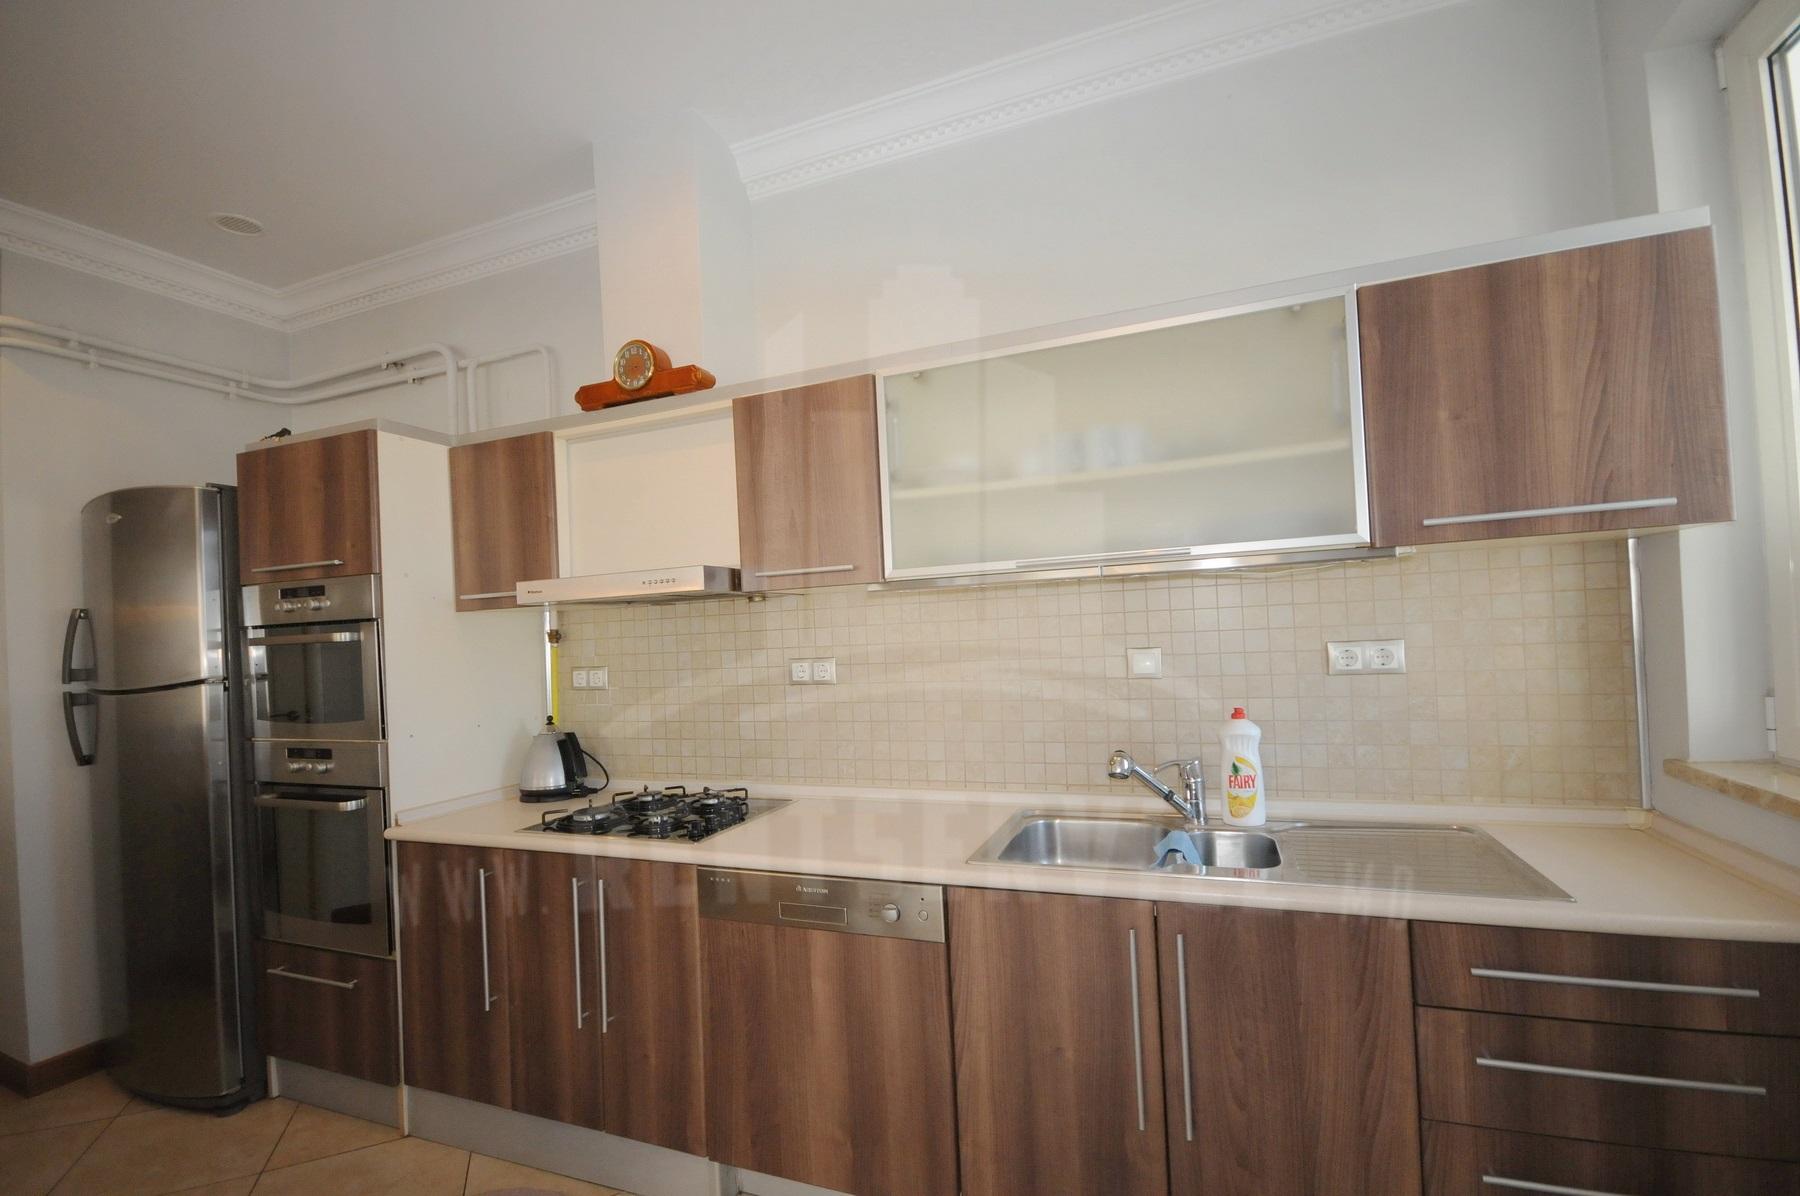 2054_apartment_10.JPG